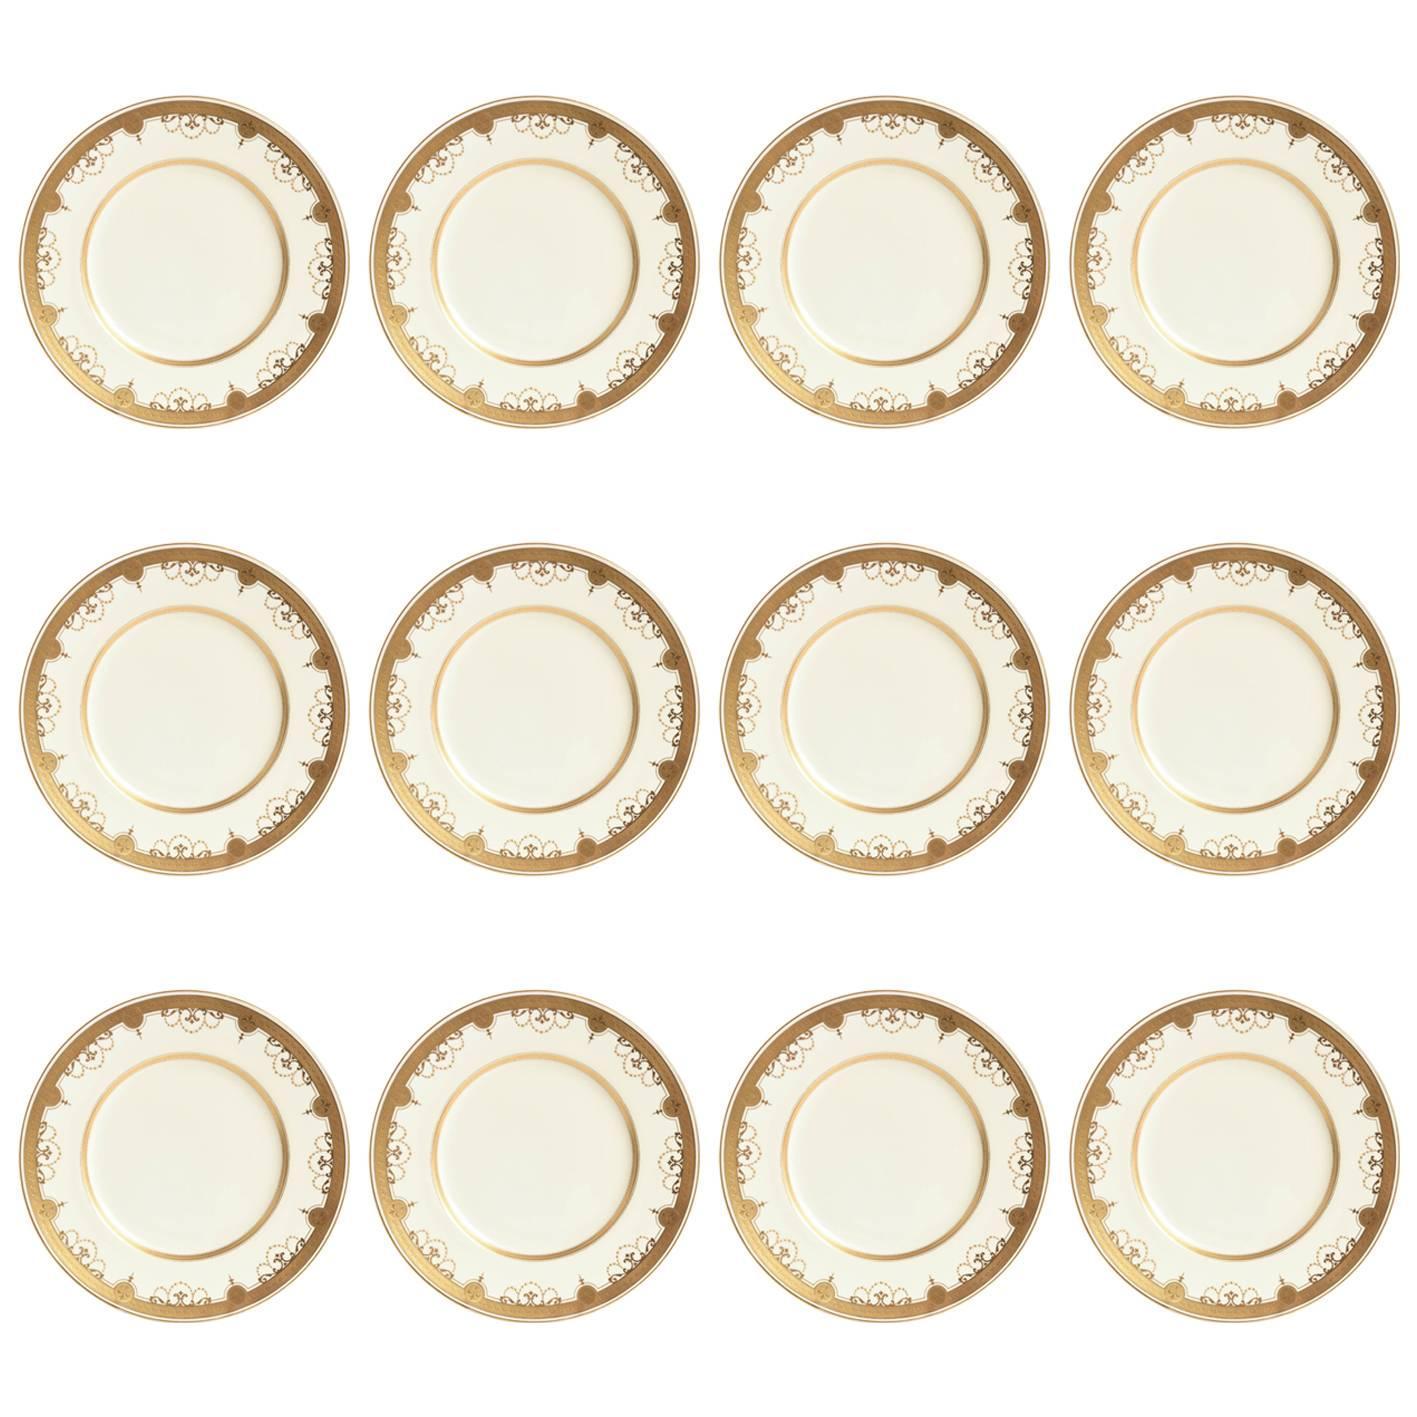 12 Antique Tiffany Dinner Plates, Heavy Gilt Encrusted Medallion Swag Design